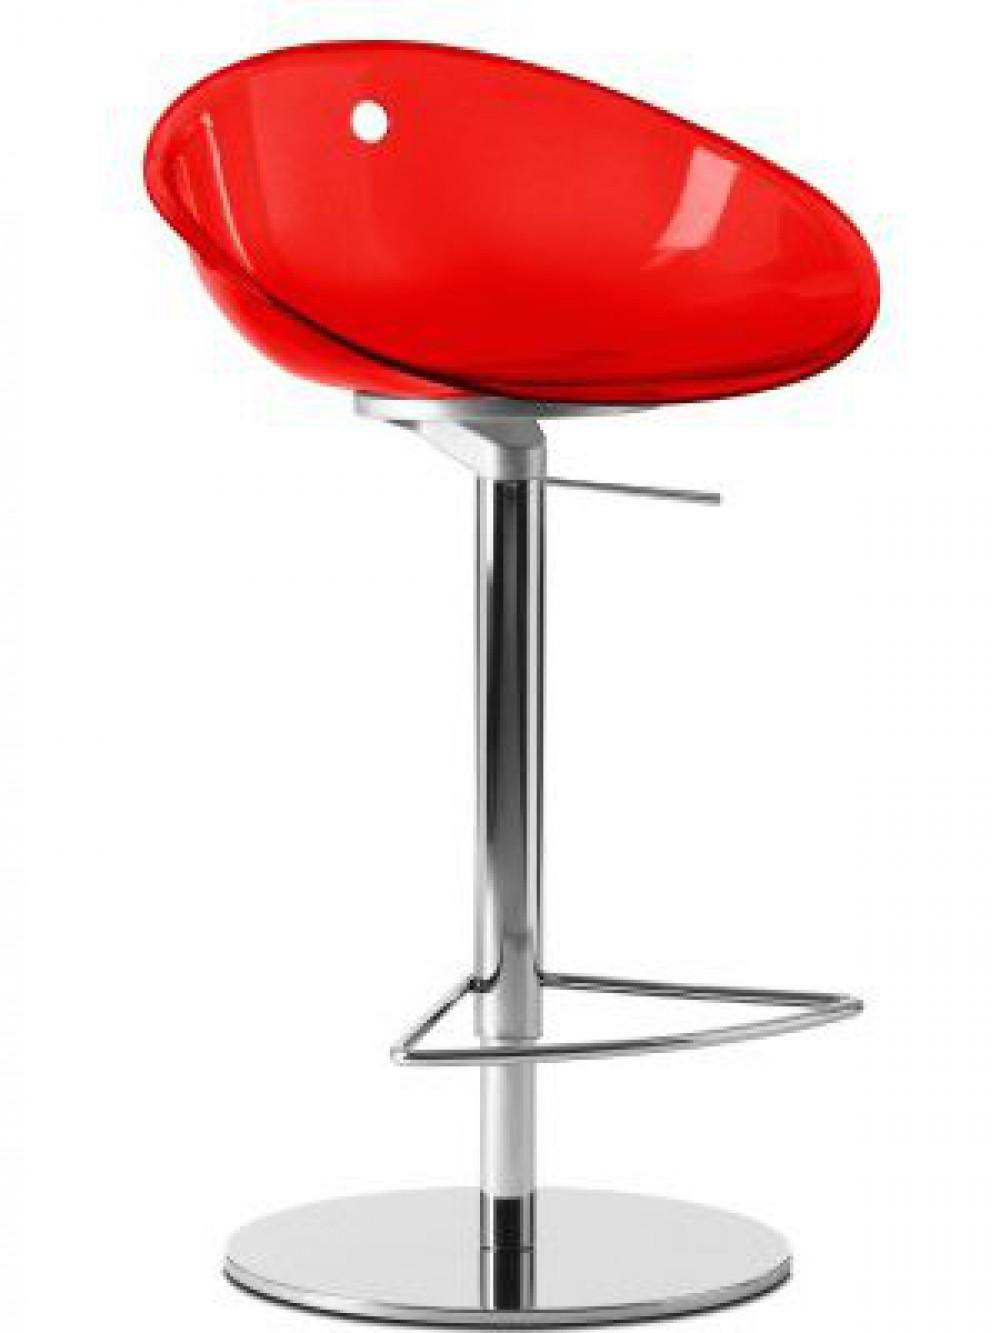 Design Barhocker, Höhenverstellbar 60 86 Cm   Barstühle U0026 Tresenhocker,  Hocker   Modern Style   Möbel